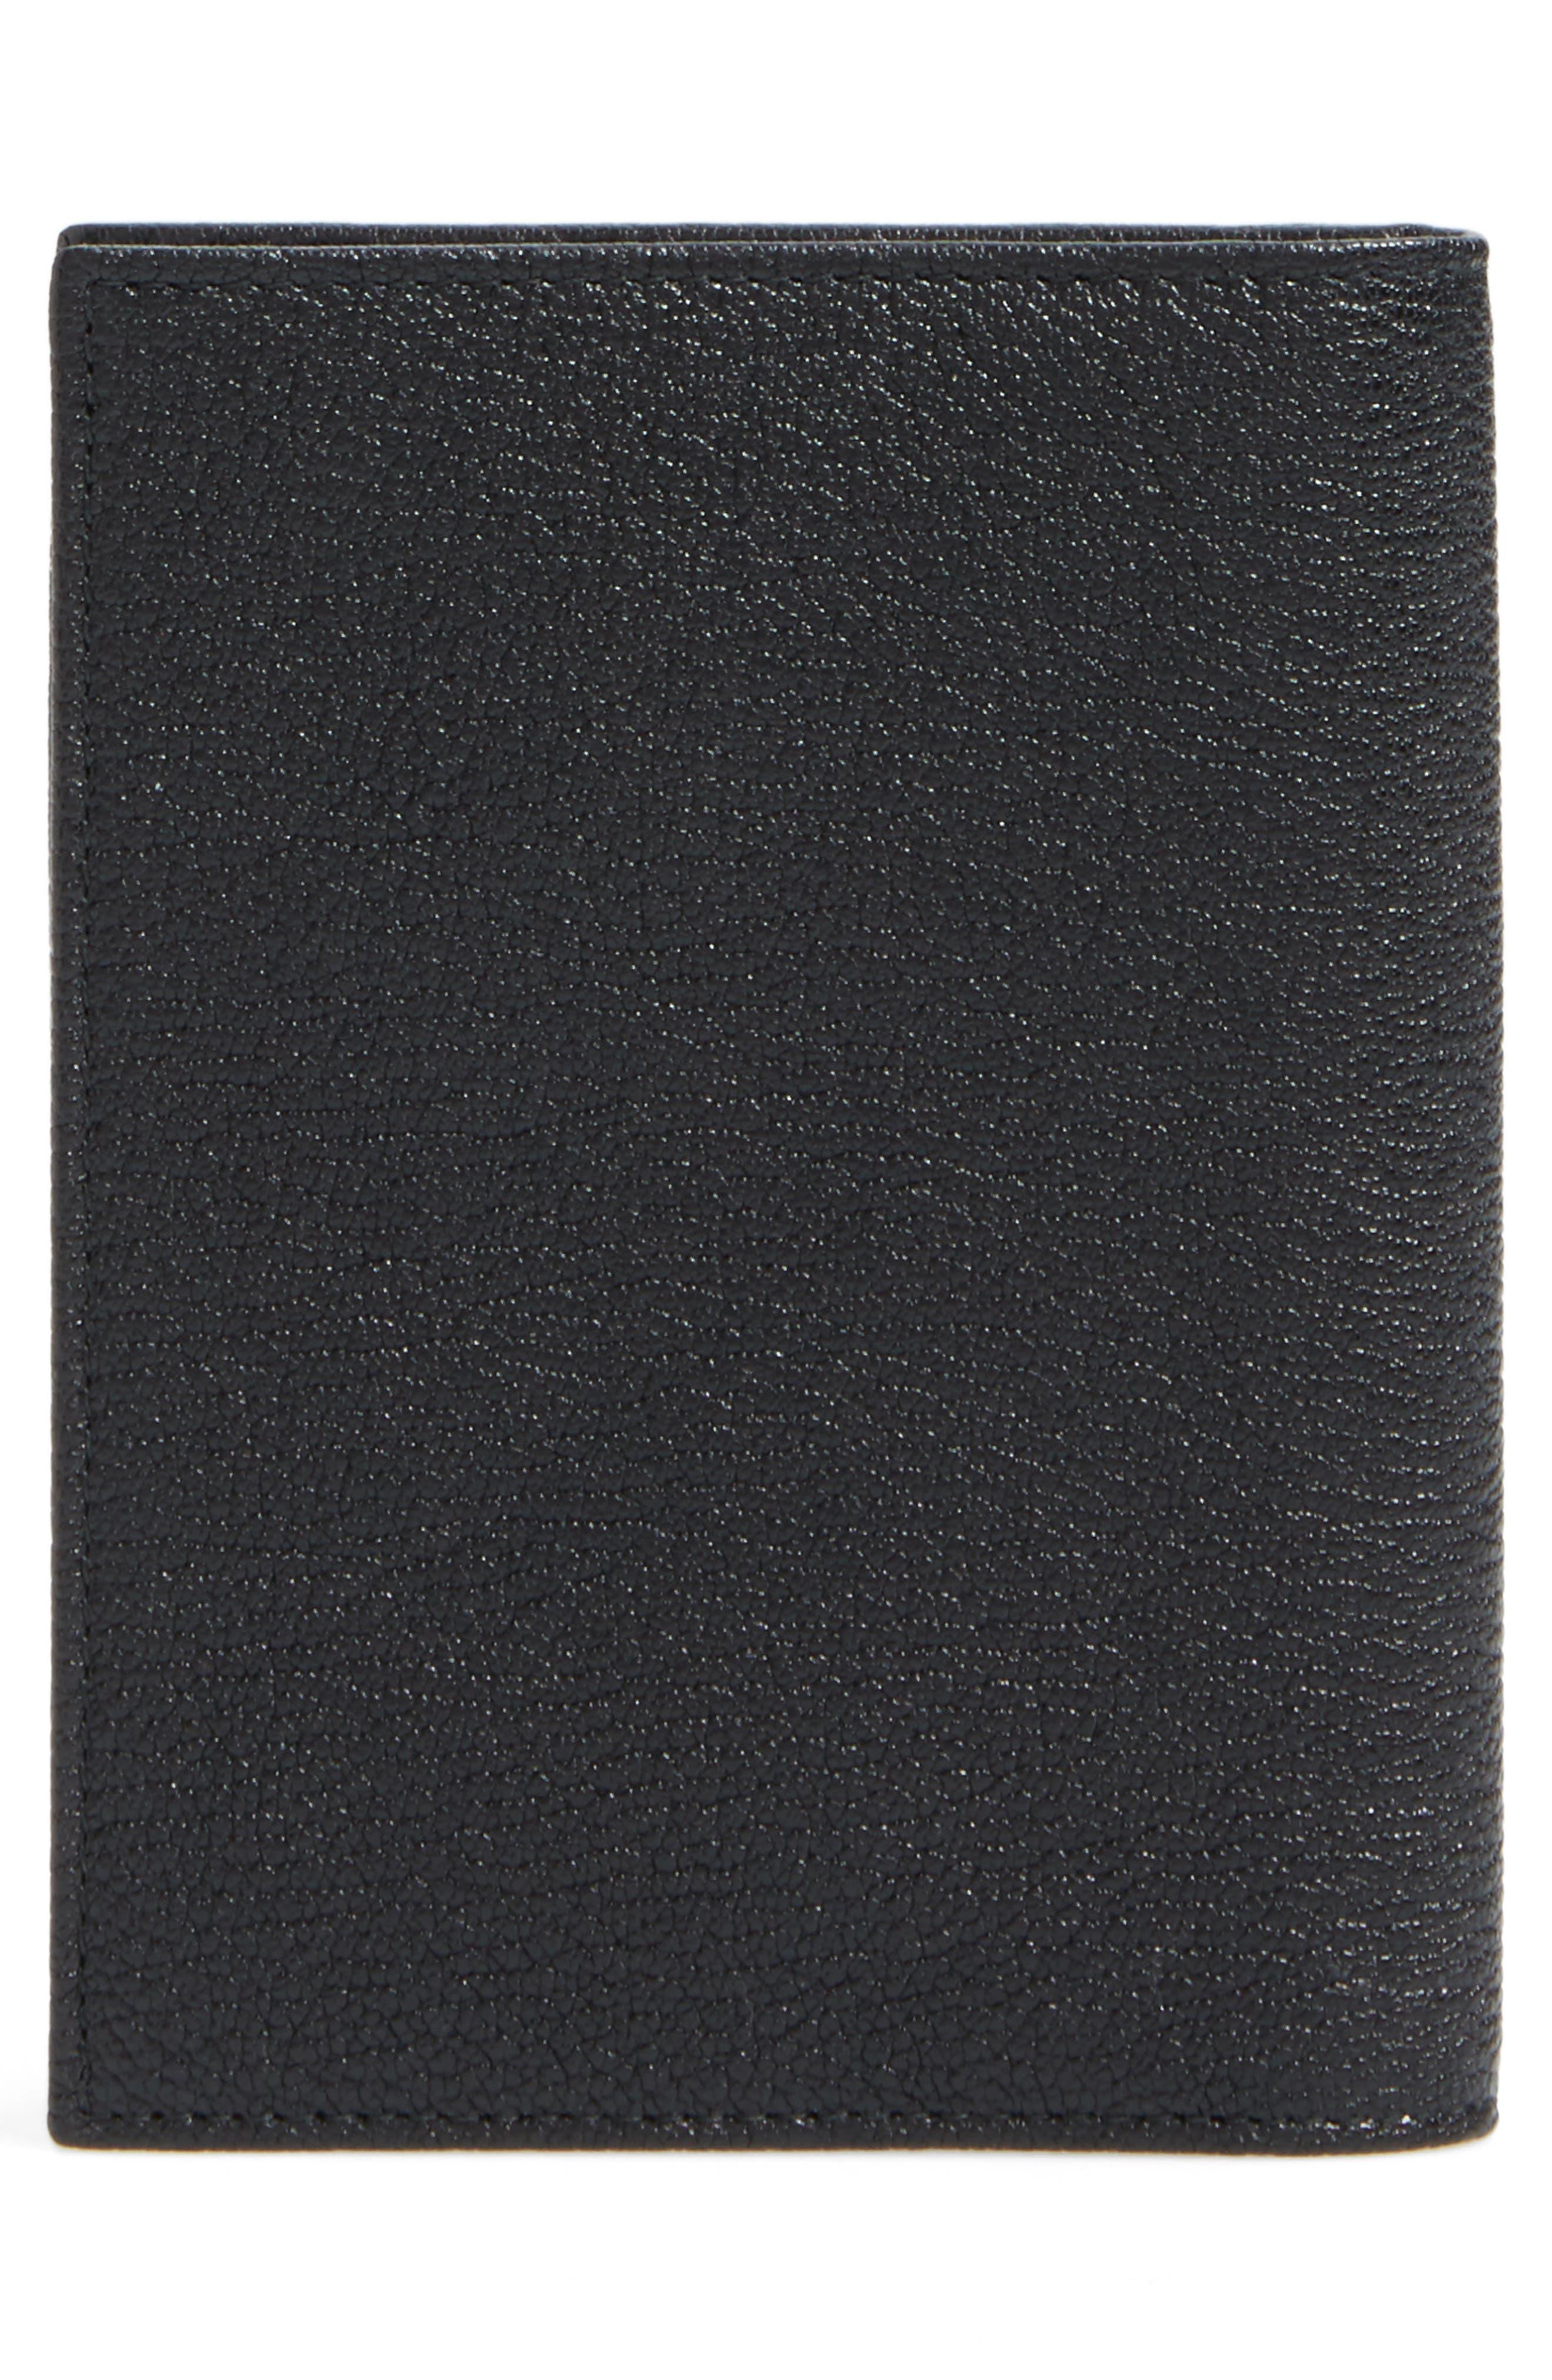 Alternate Image 3  - Miu Miu Leather Passport Case